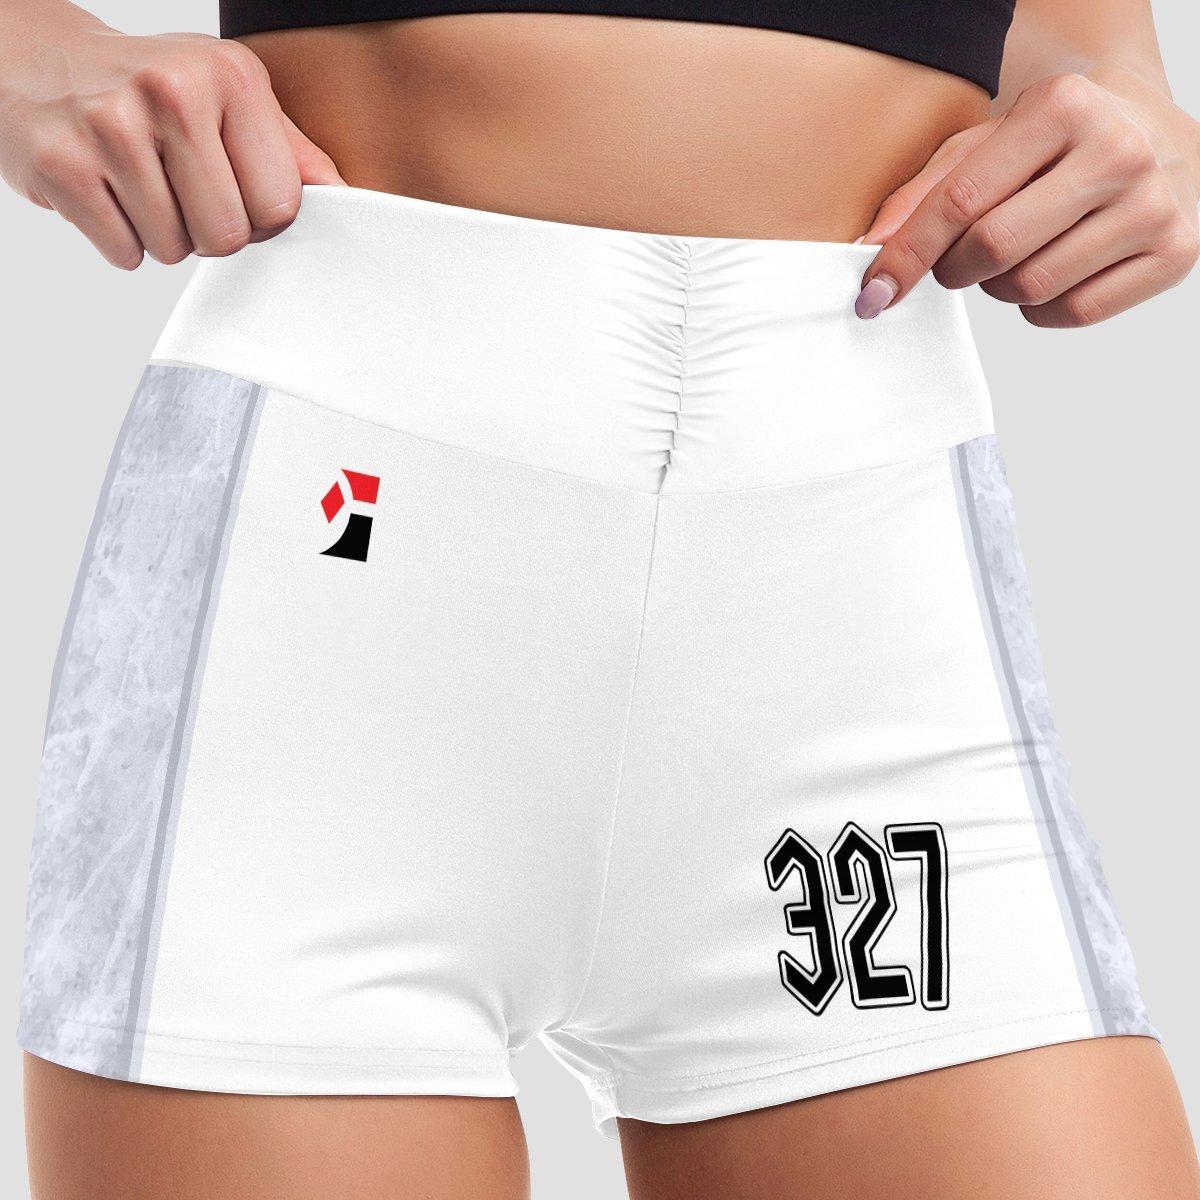 pokemon ice uniform active wear set 241687 - Anime Swimsuits